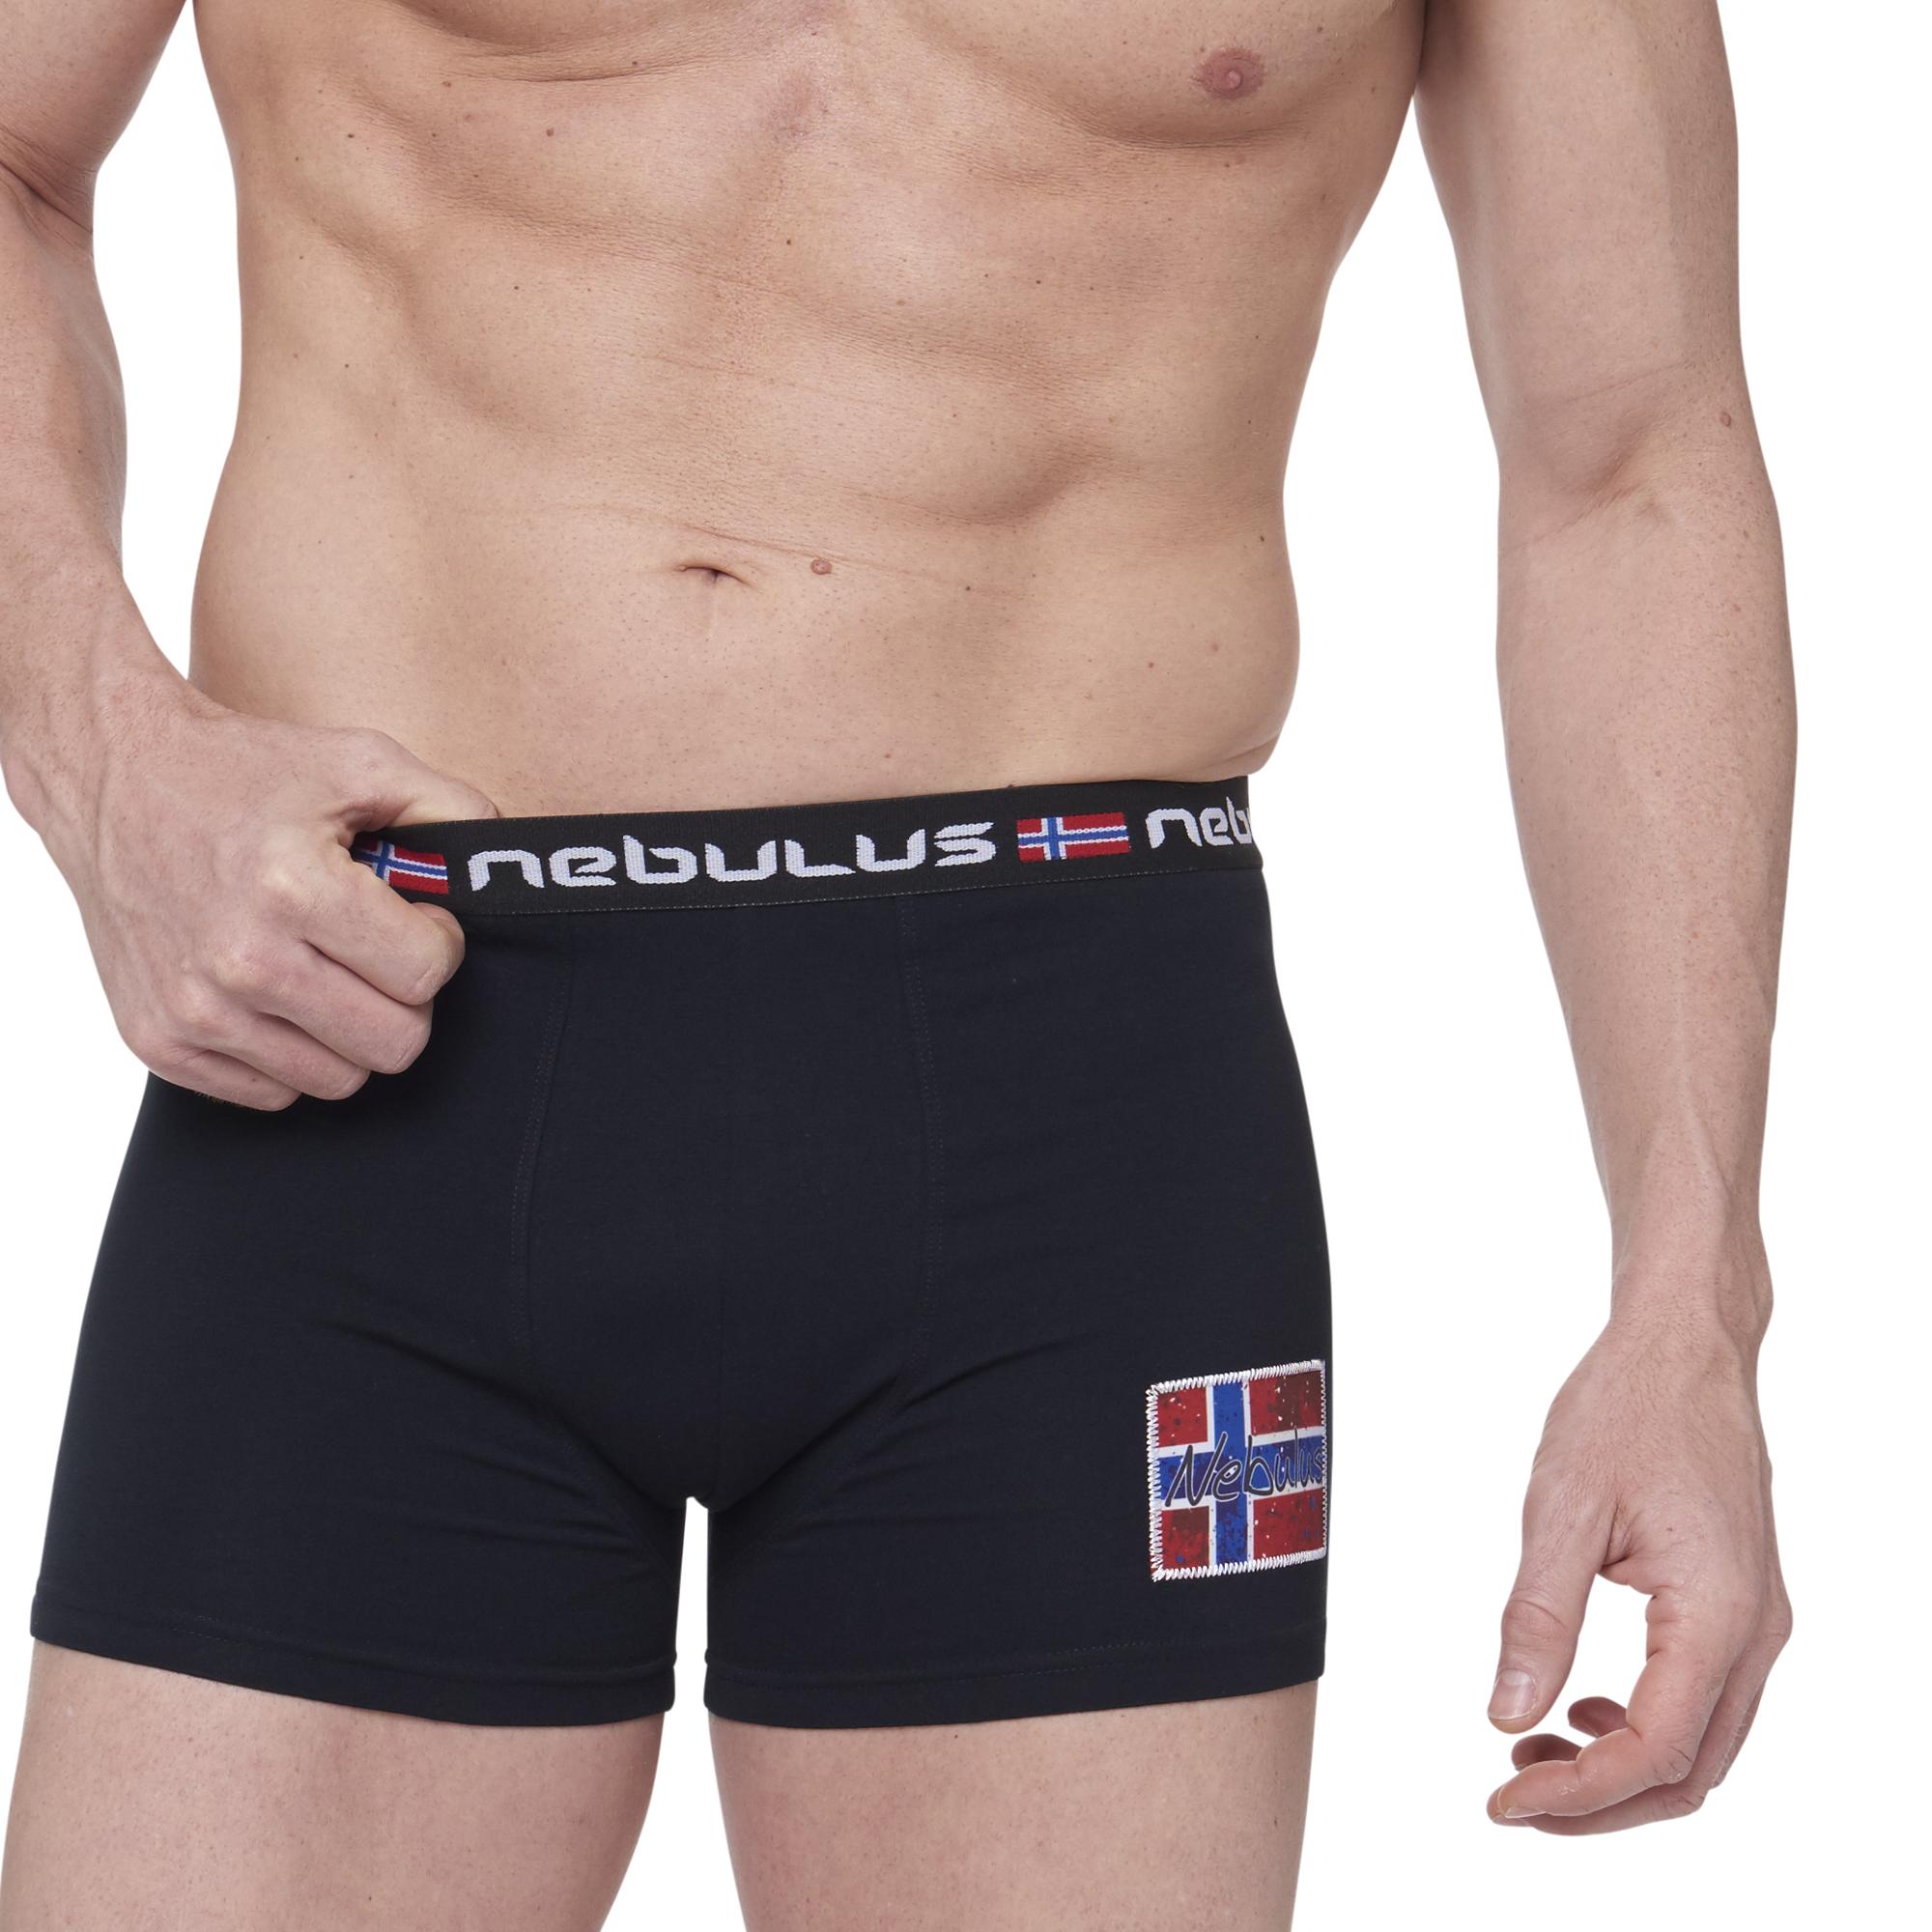 nebulus 3er pack boxershorts diego unterhosen shorts schwarz l q1847 eur 11 10 picclick de. Black Bedroom Furniture Sets. Home Design Ideas